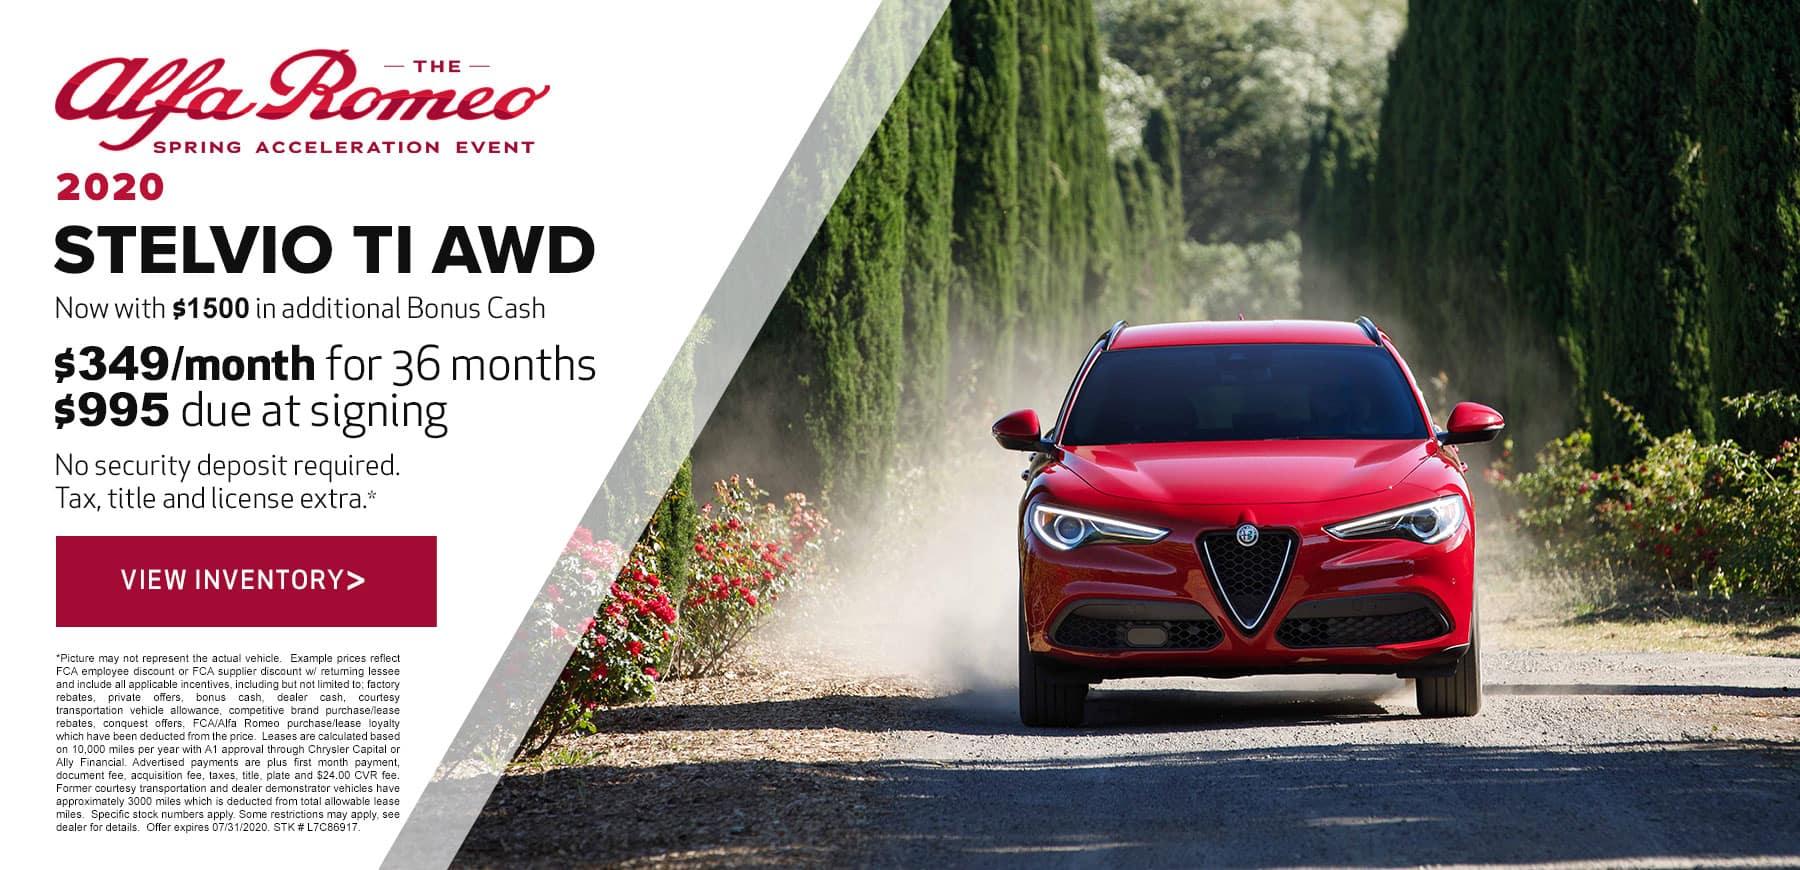 Genesis Alfa Romeo July 2020 Stelvio Lease Offer